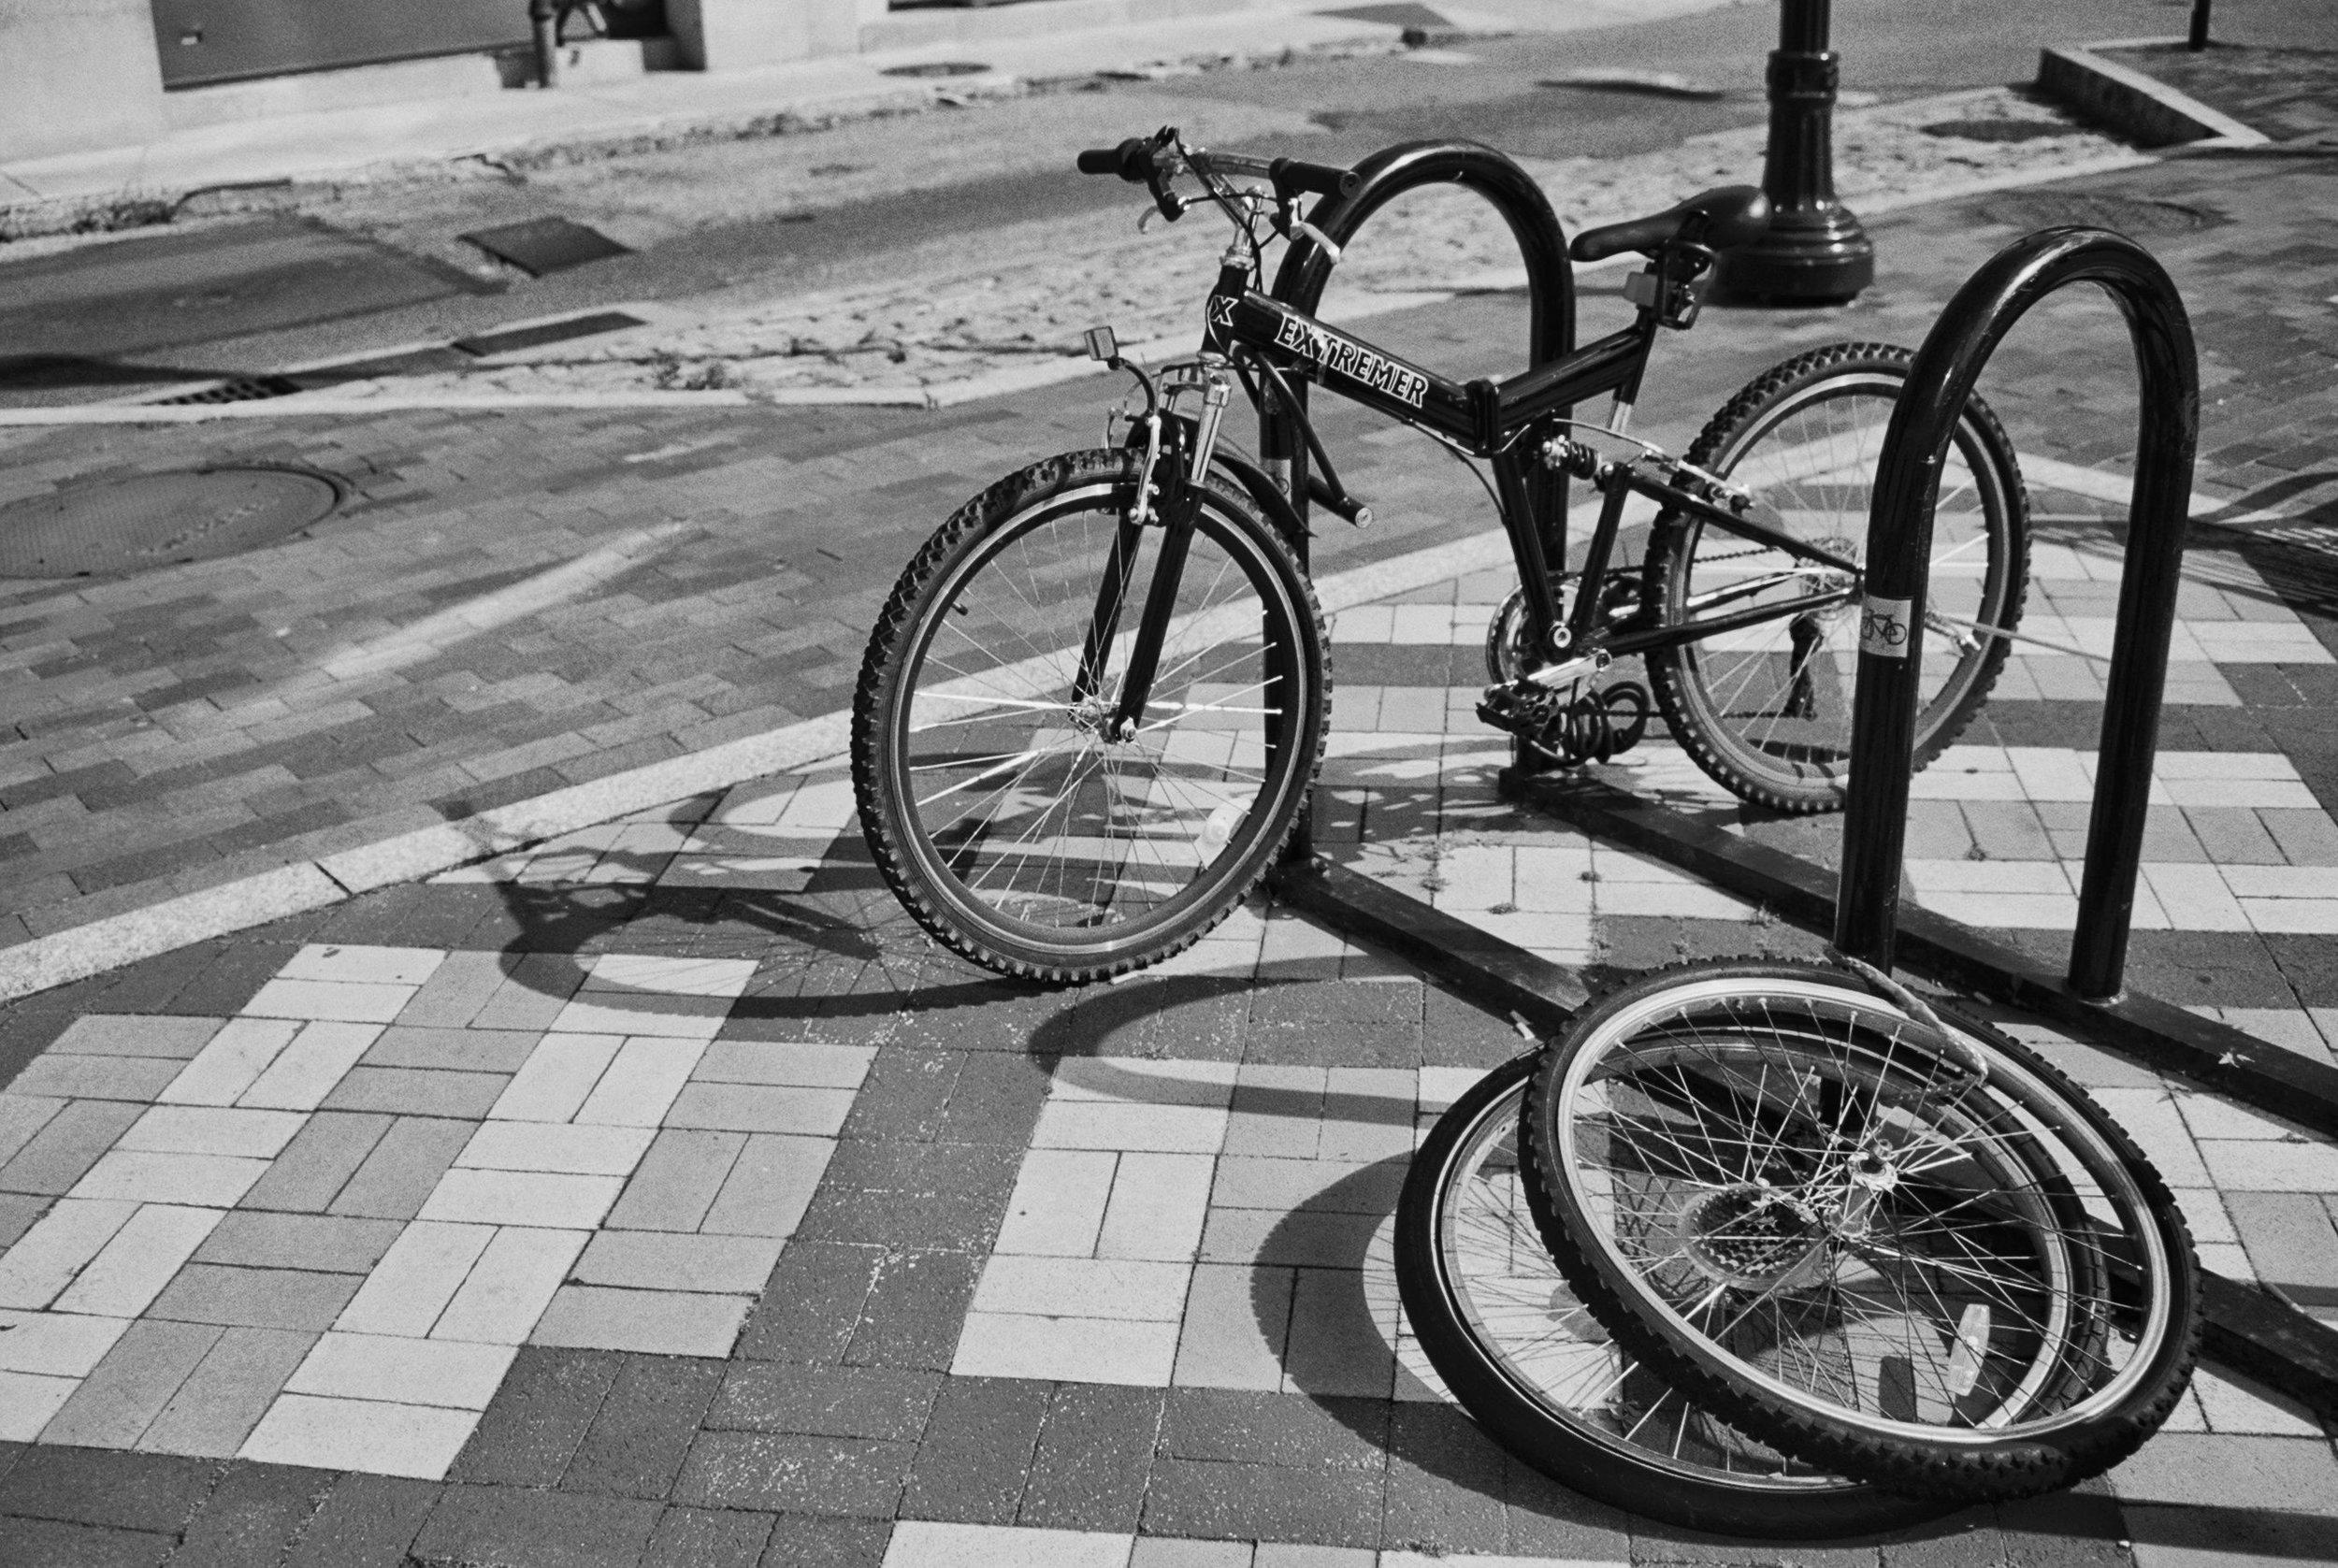 bike-Luis-lopez-photography.jpeg